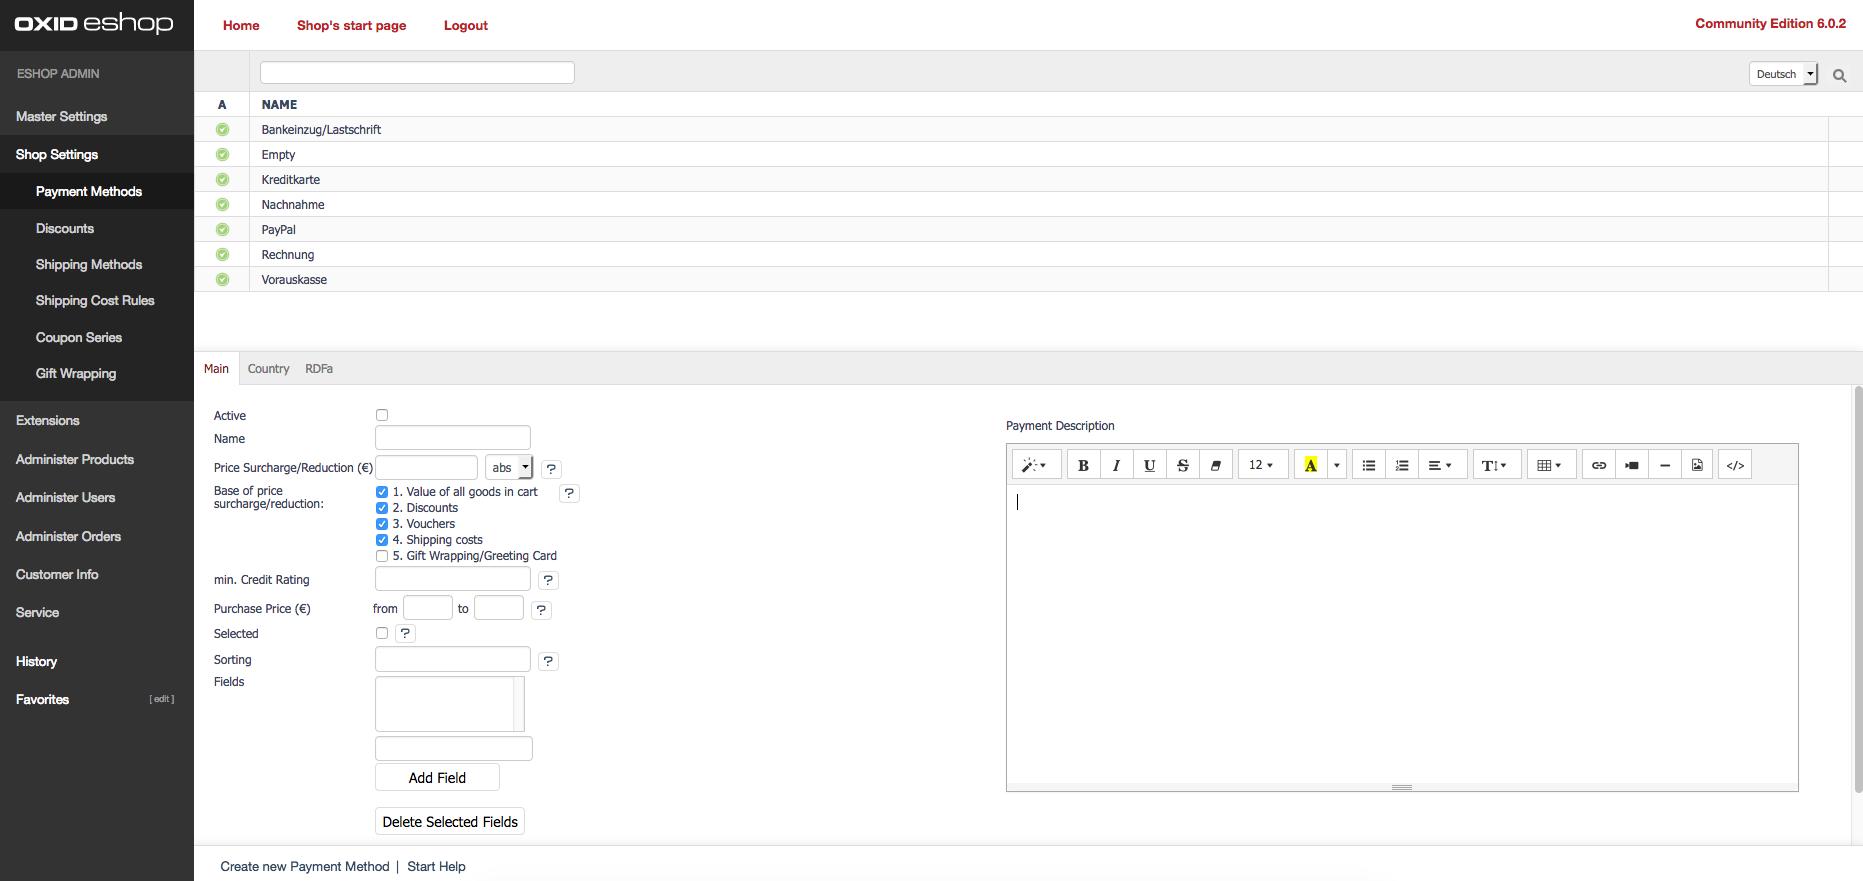 OXID eShop Admin Demo - Payment Methods